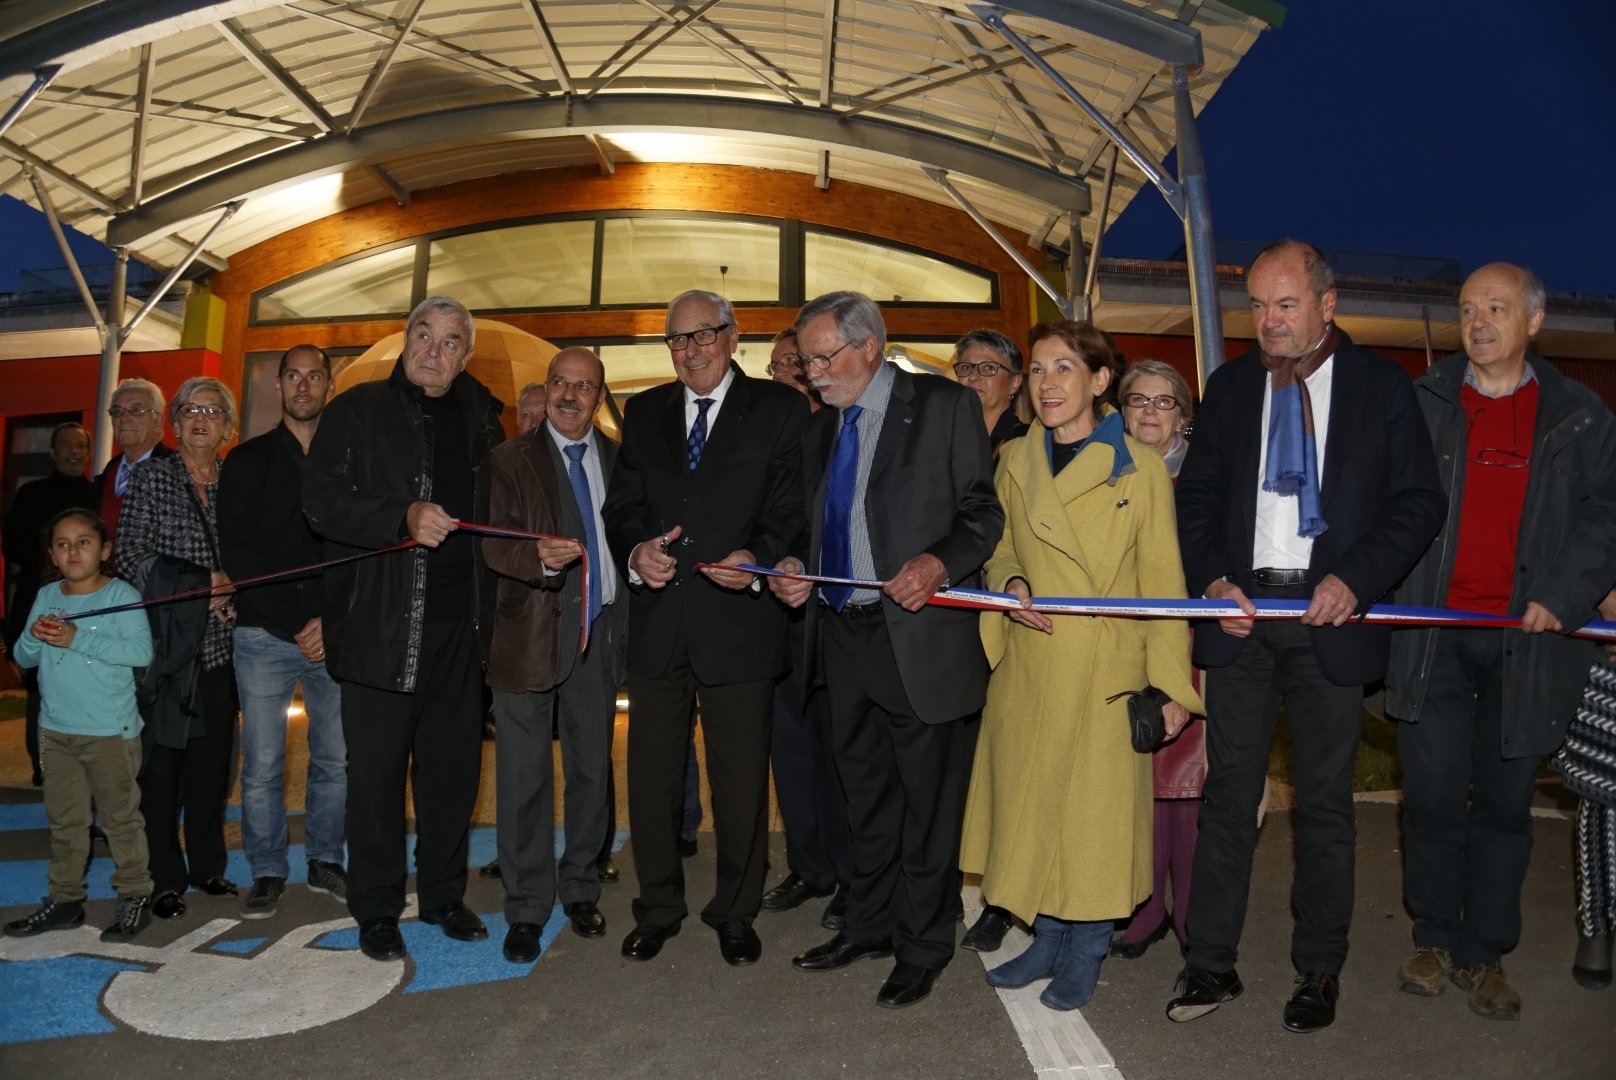 Inauguration du pôle multi-accueil du Moulin Neuf